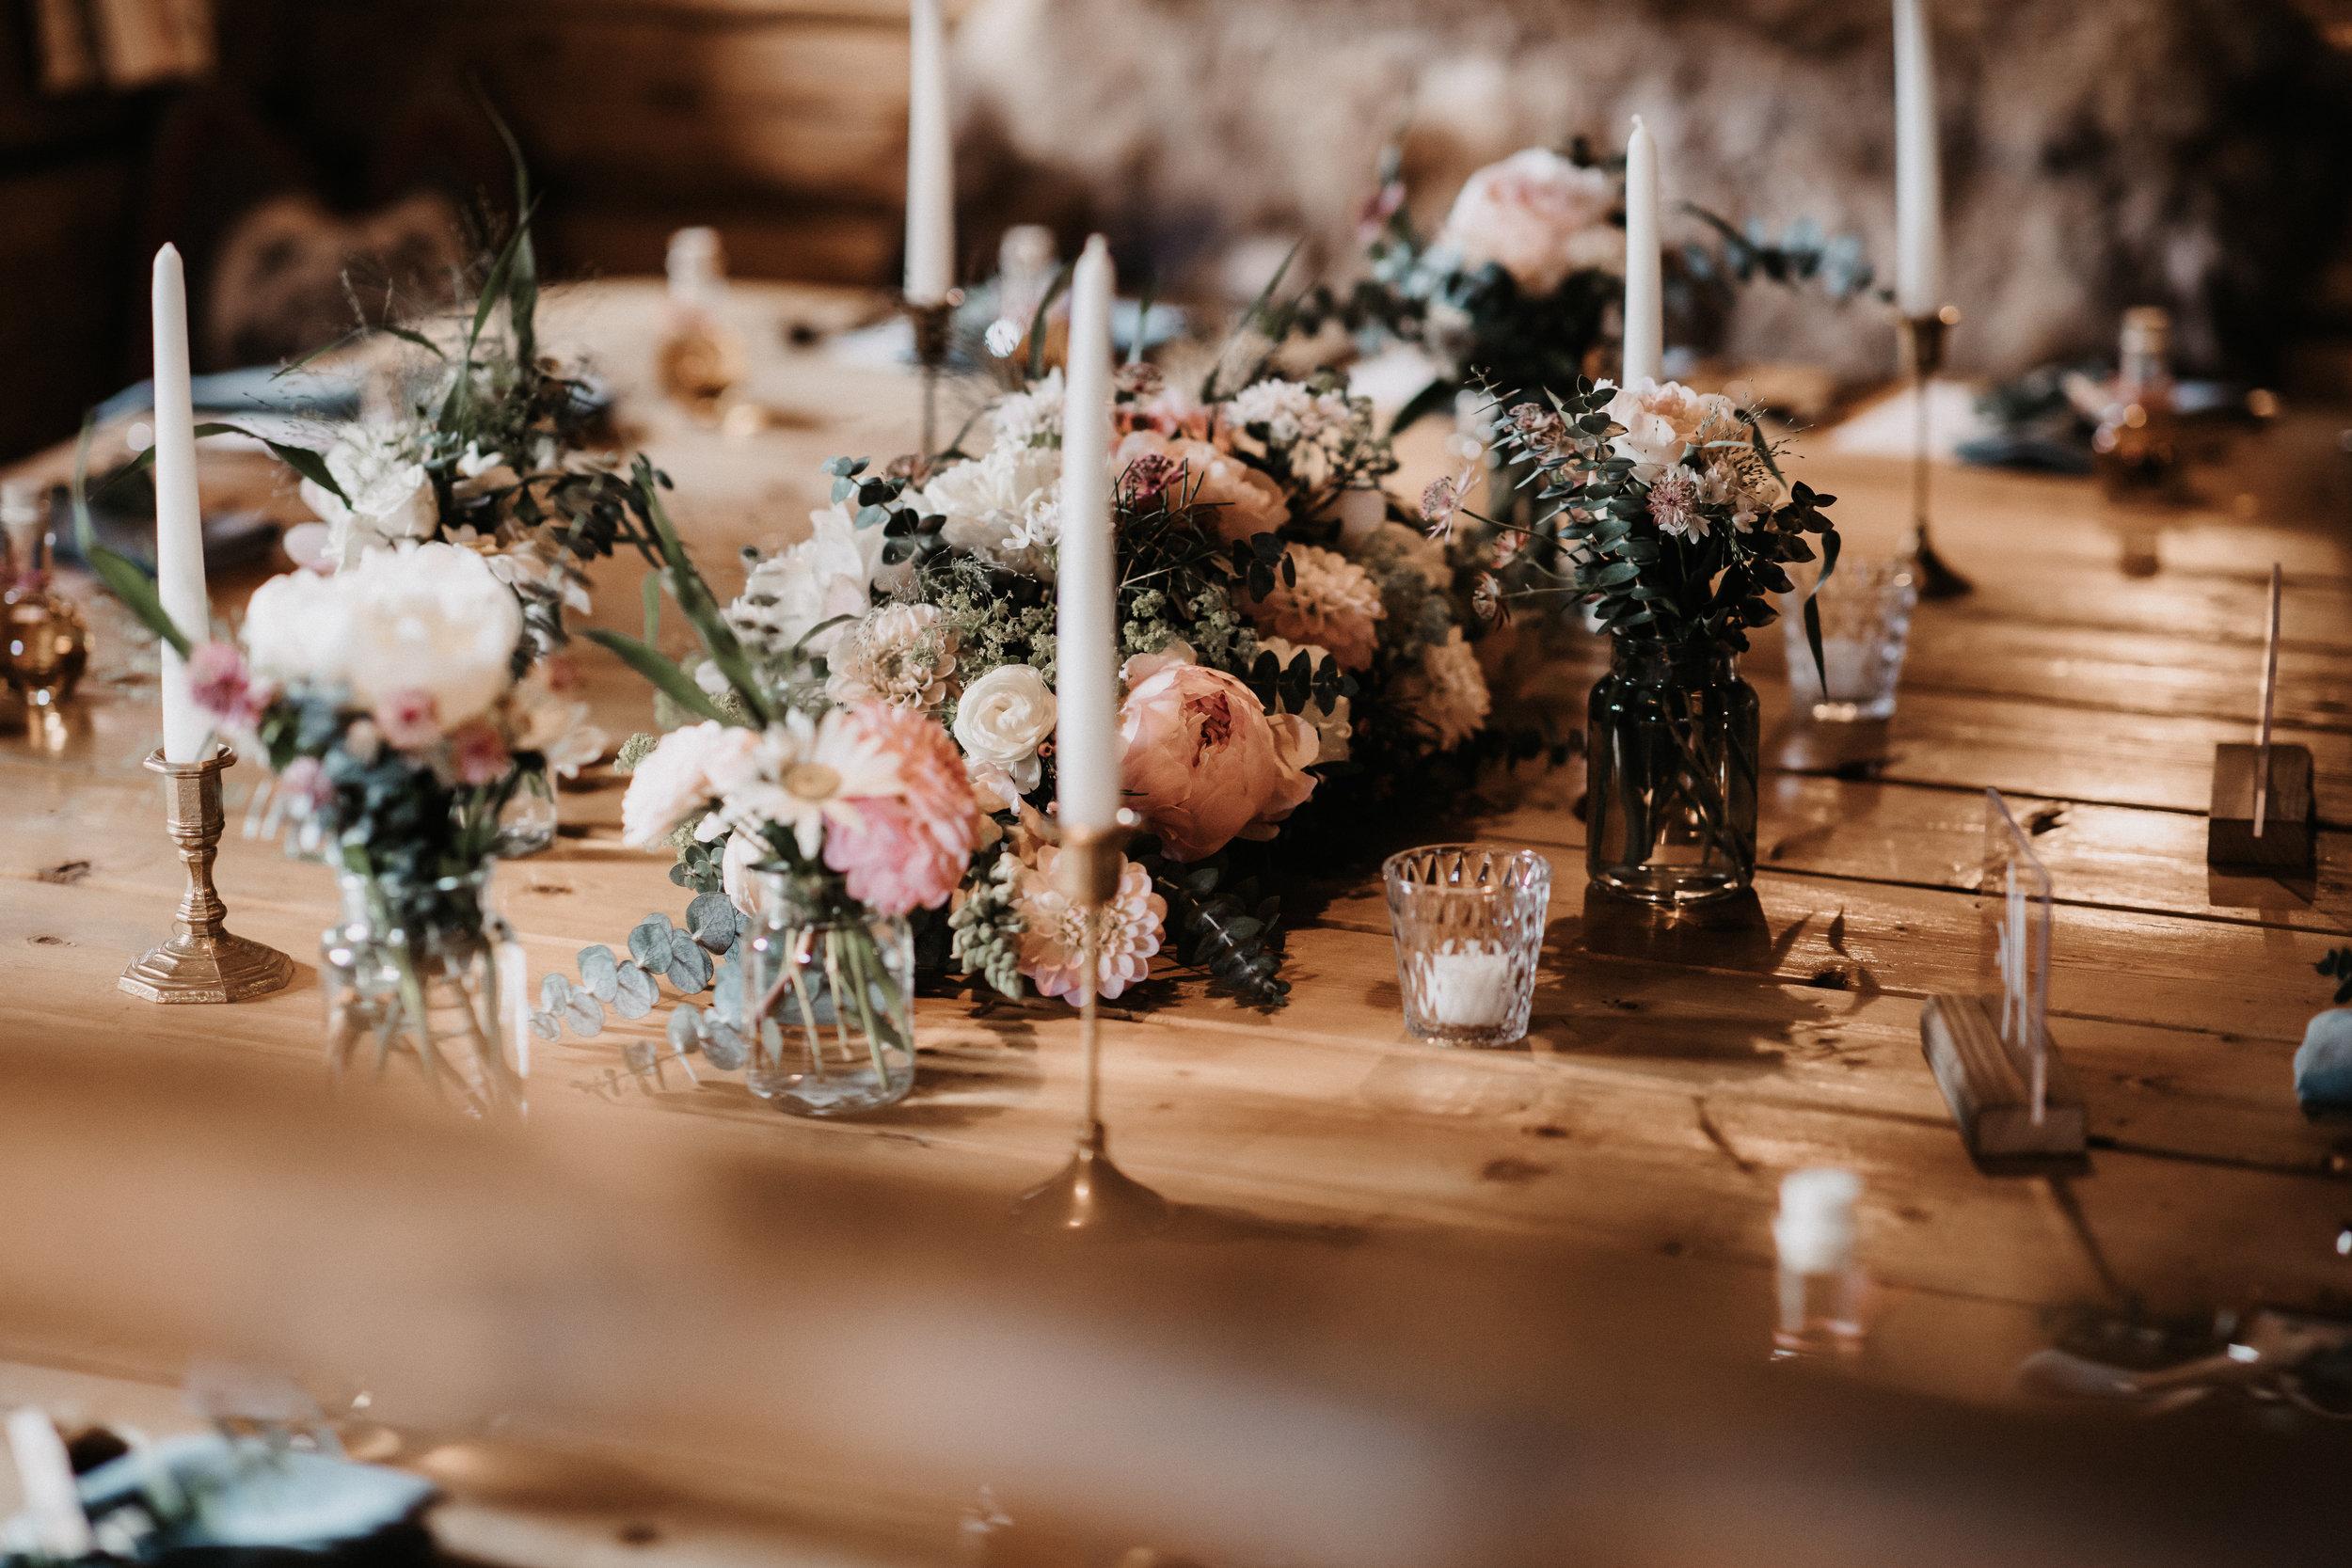 rosemarrylemon_ab_Hochzeitsdekoration12.jpg